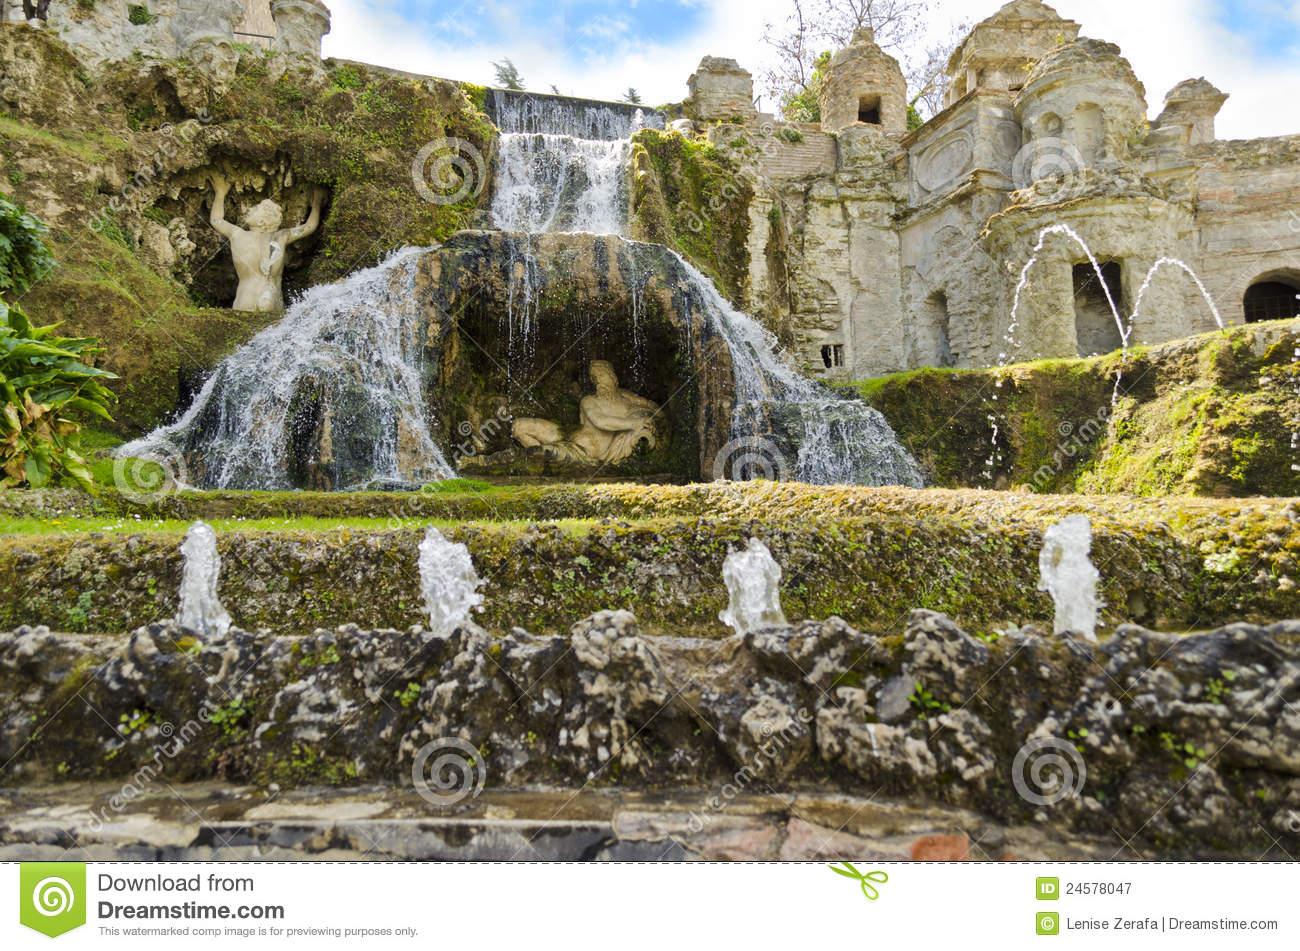 Gardens Of Villa D'Este In Tivoli.